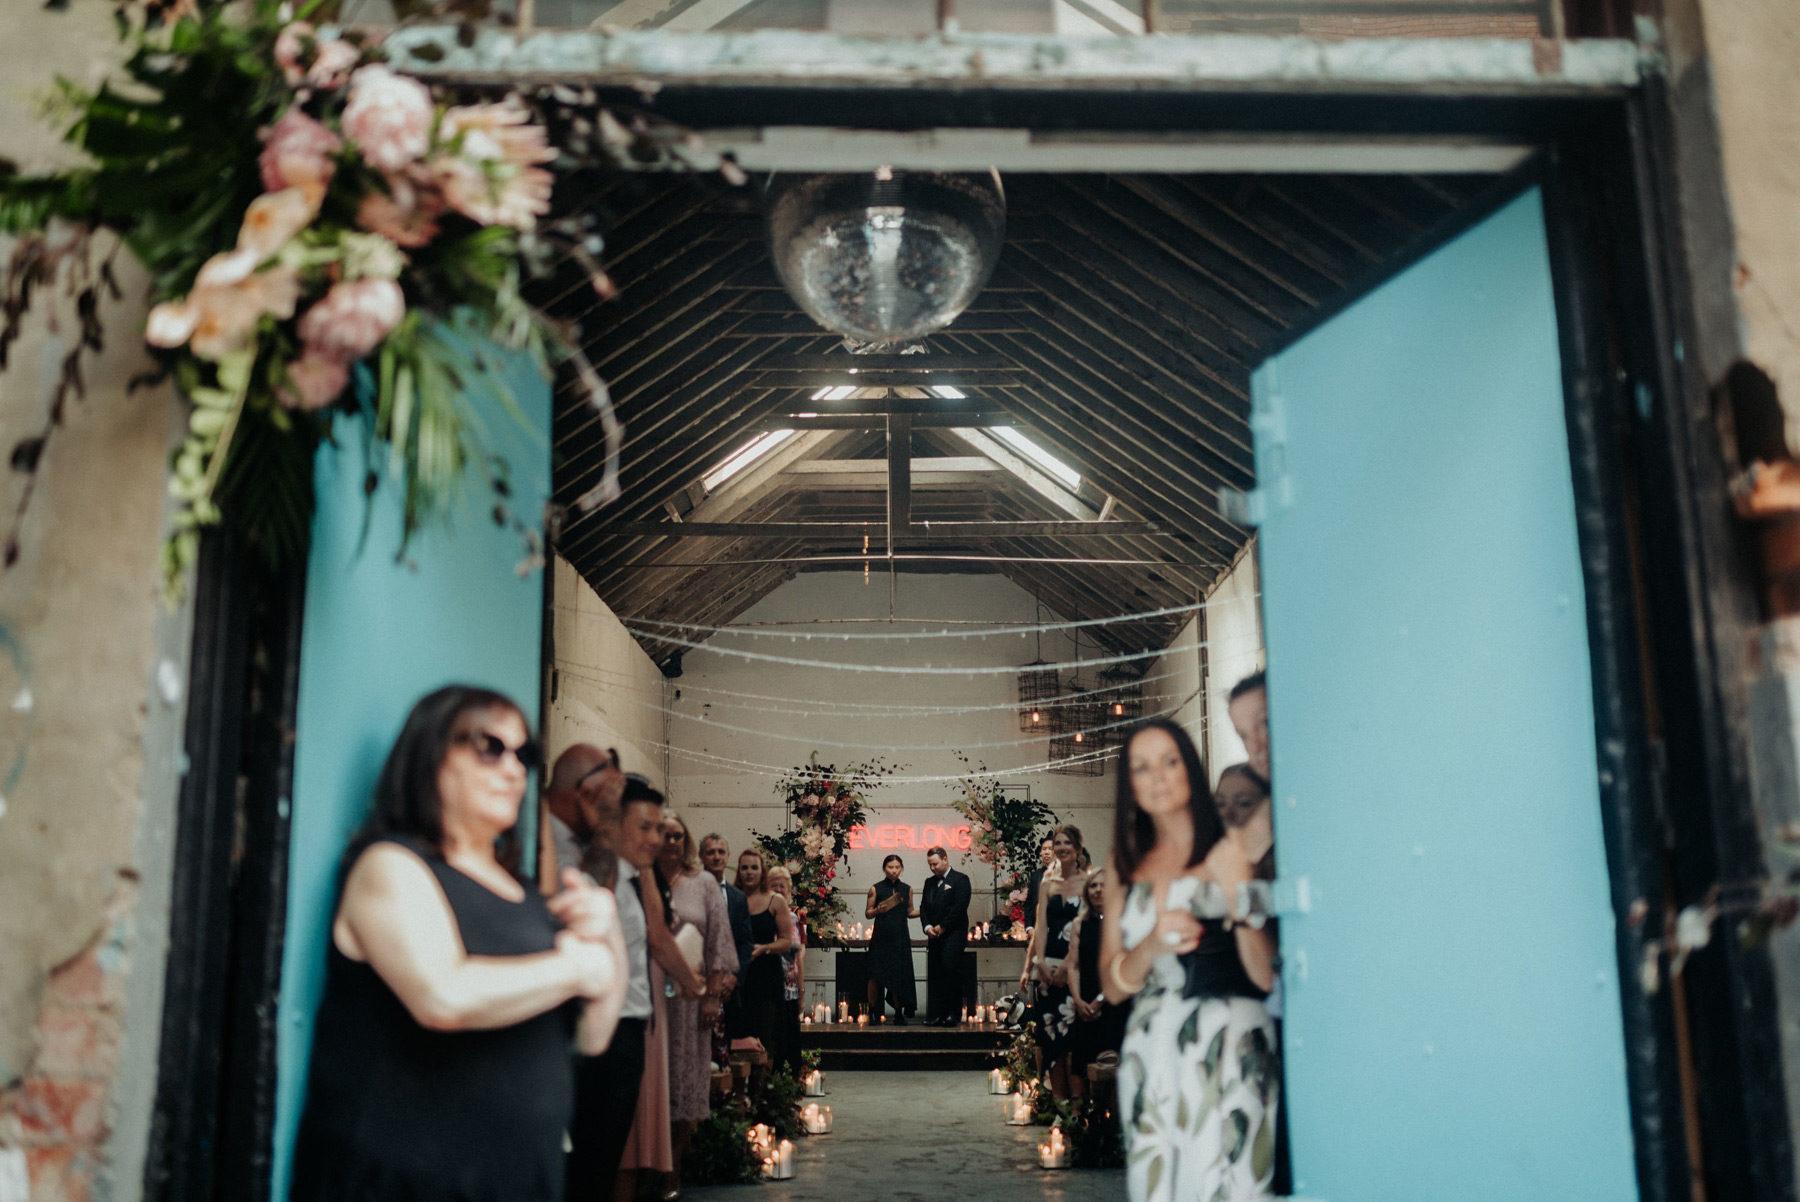 bang-bang-boogaloo-wedding-melbourne-07-1800x0-c-default.jpg